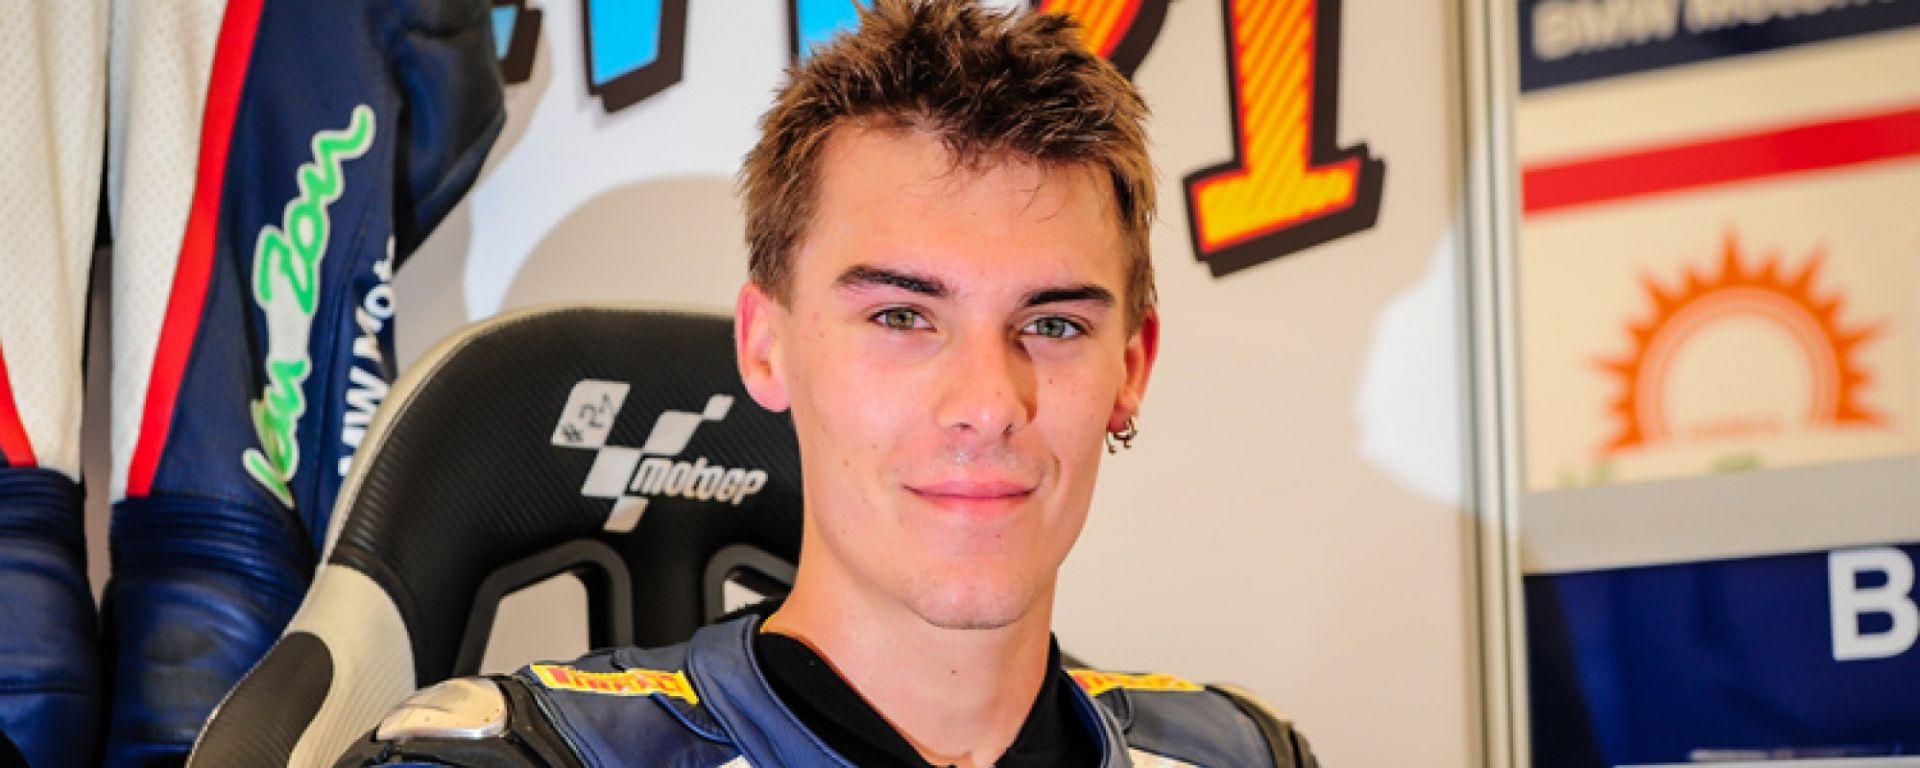 Markus Reiterberger #21